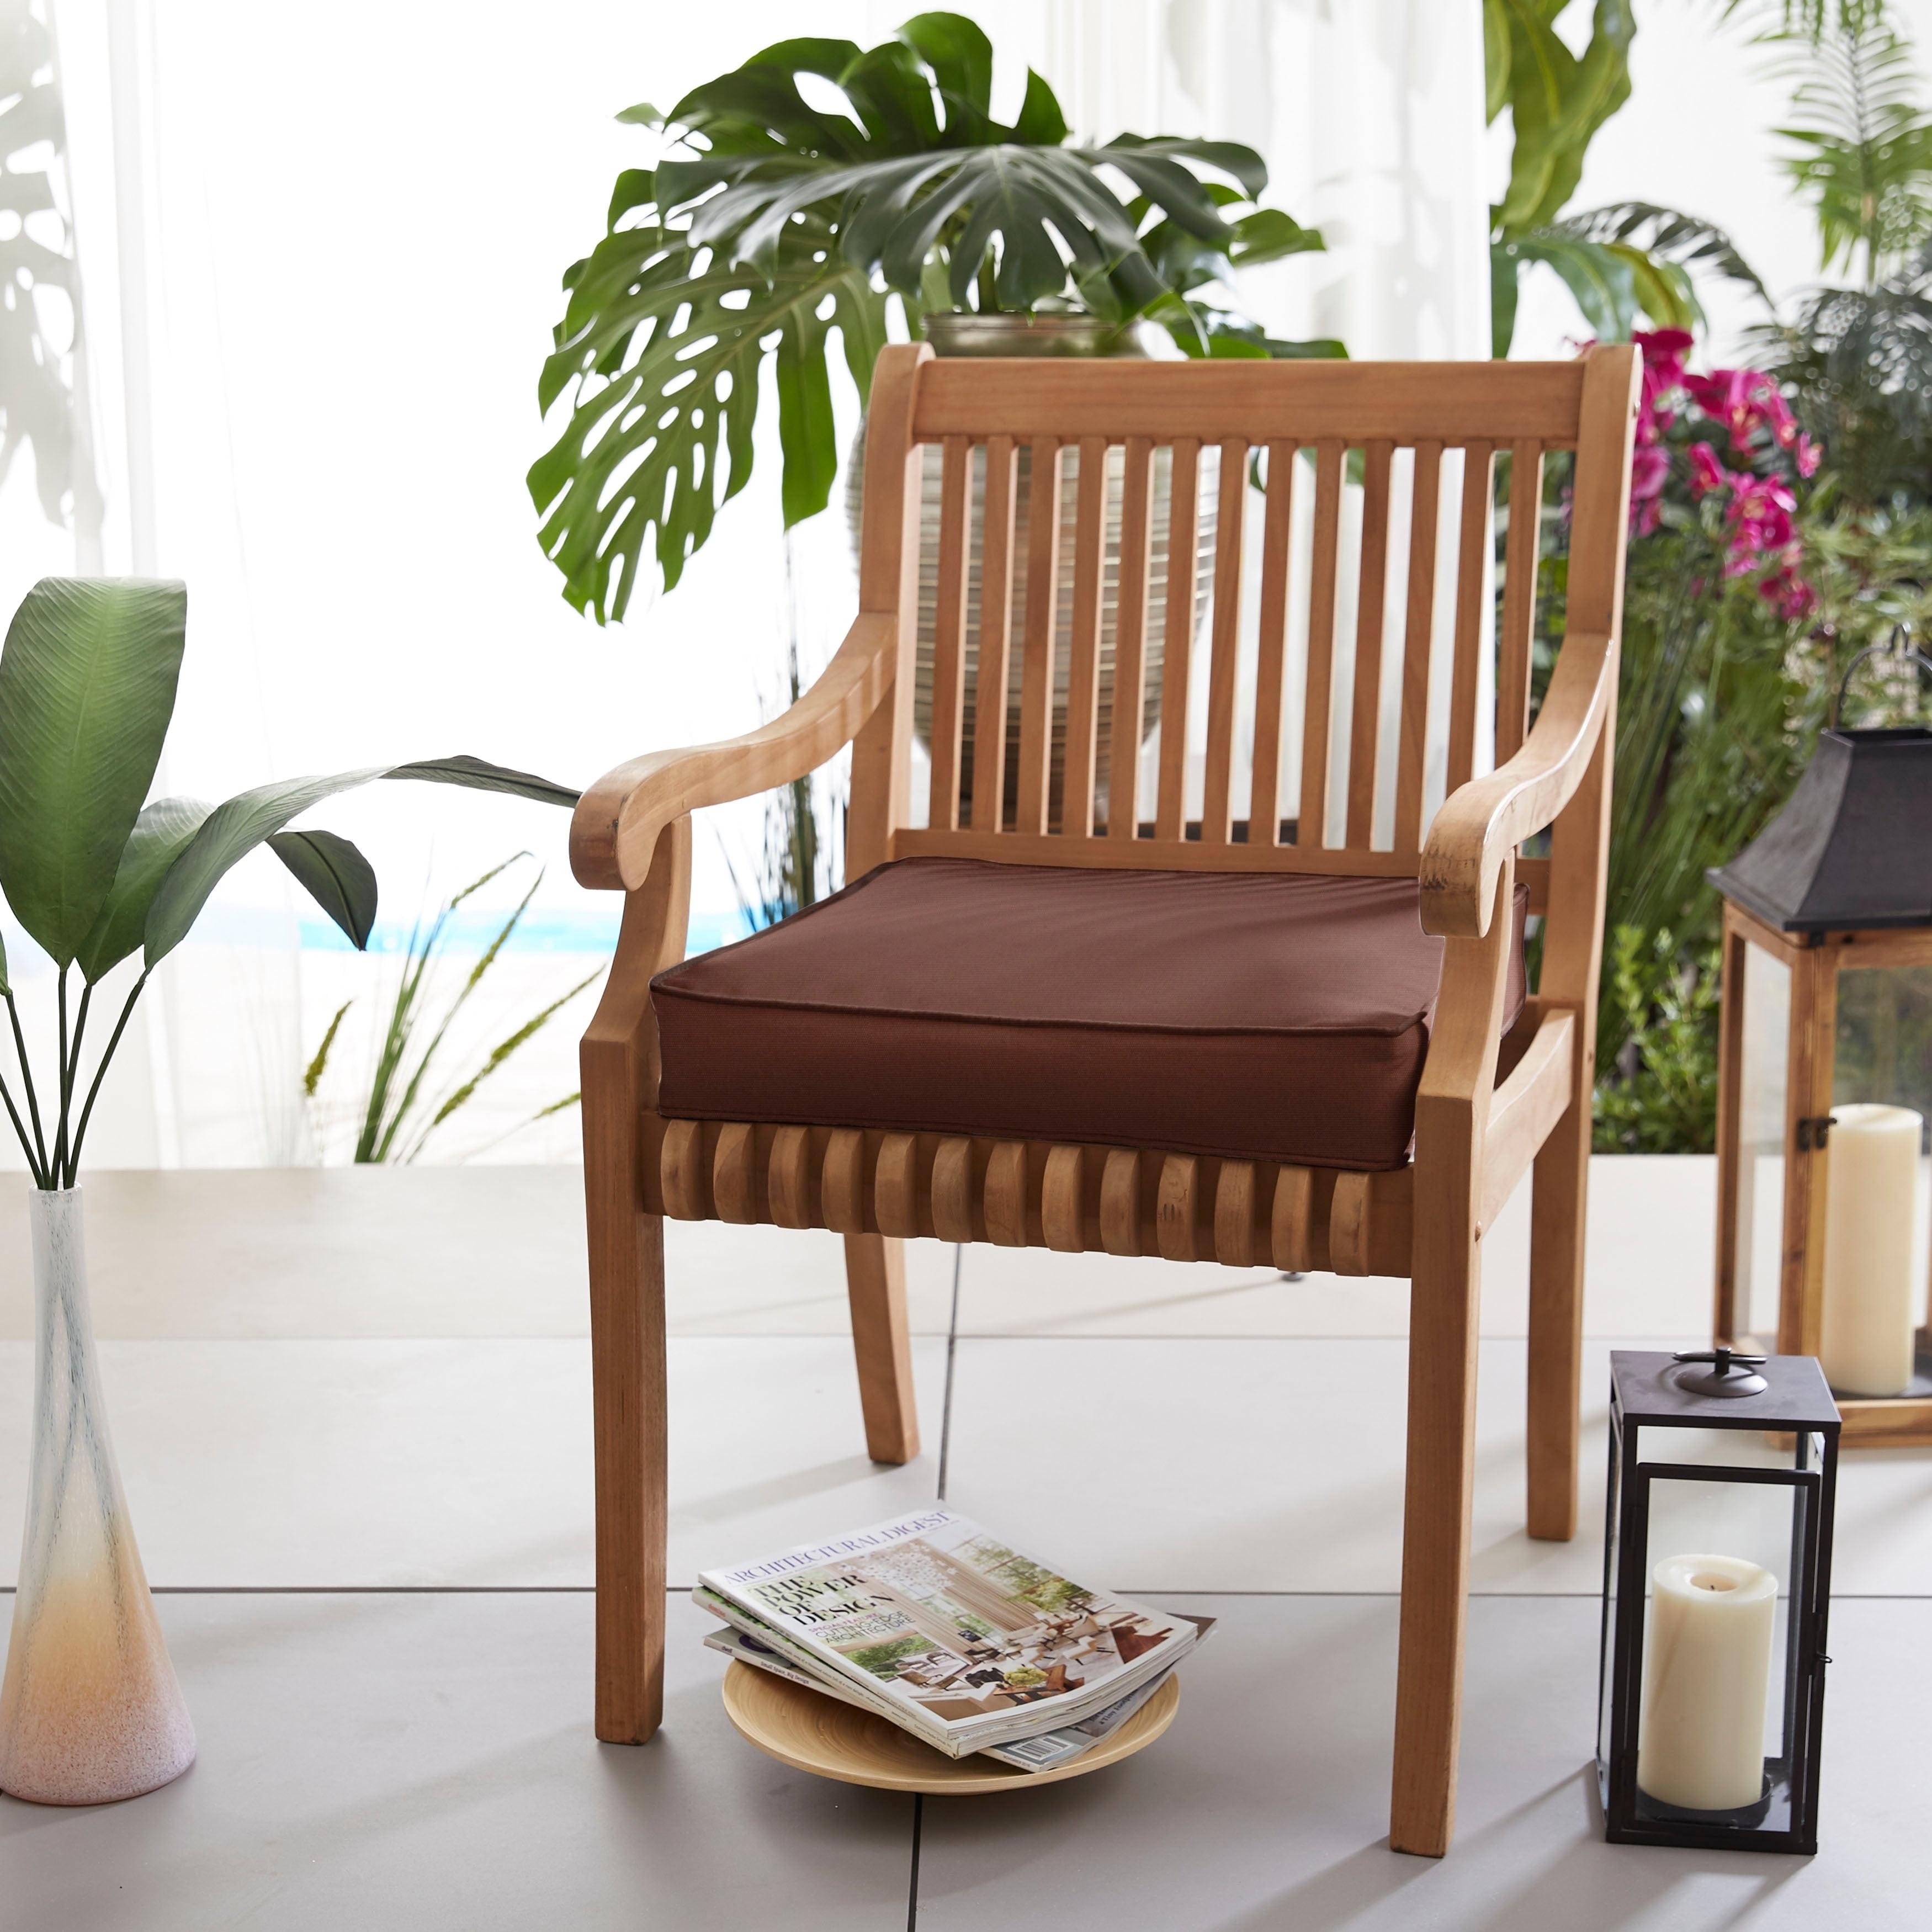 Outdoor 20 Inch Chair Cushion